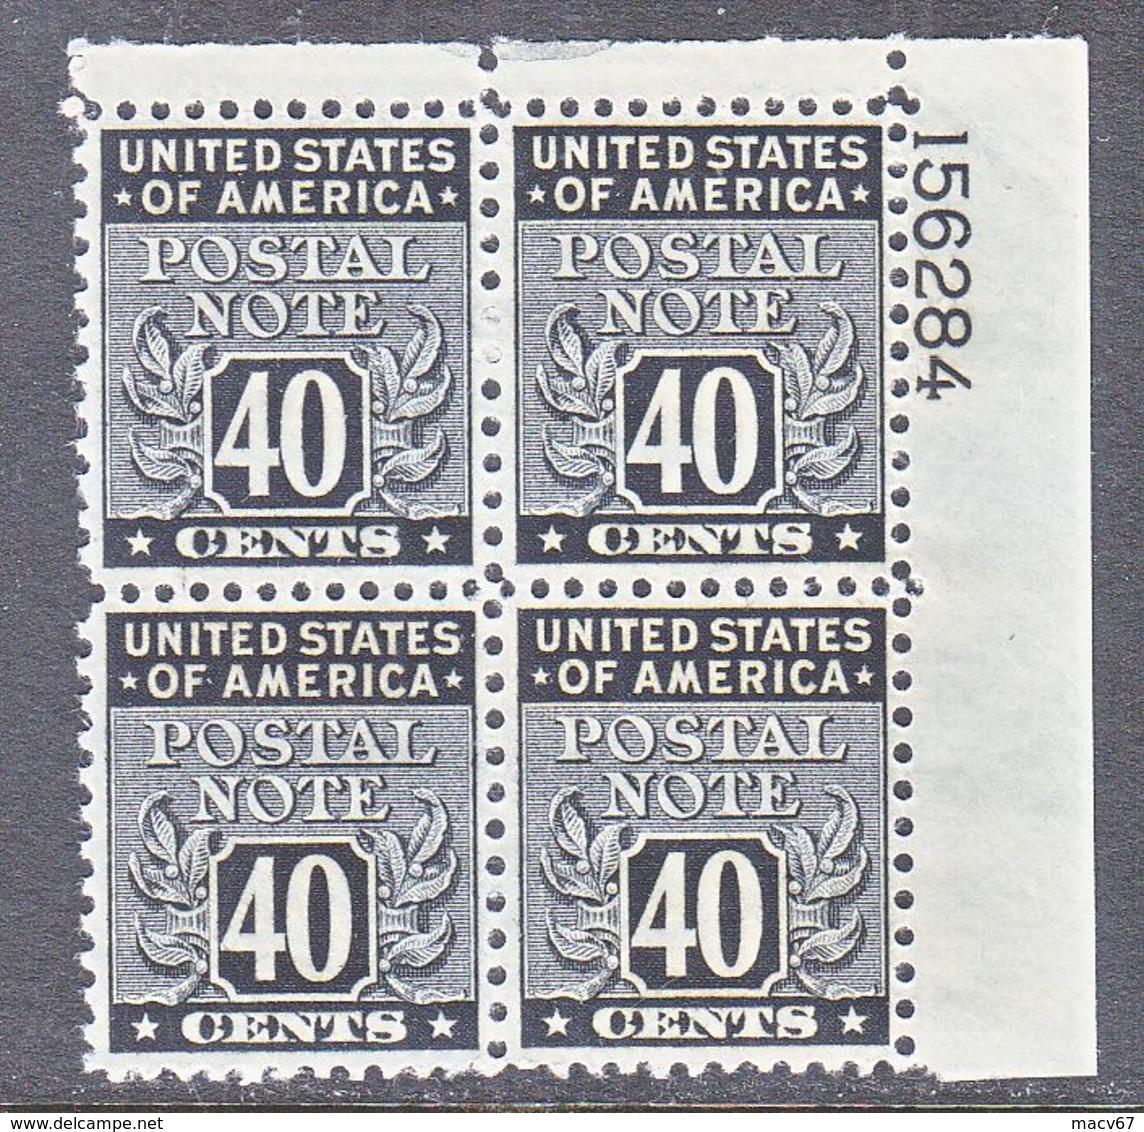 U.S. POSTAL  NOTE  PN 13  ** - Revenues